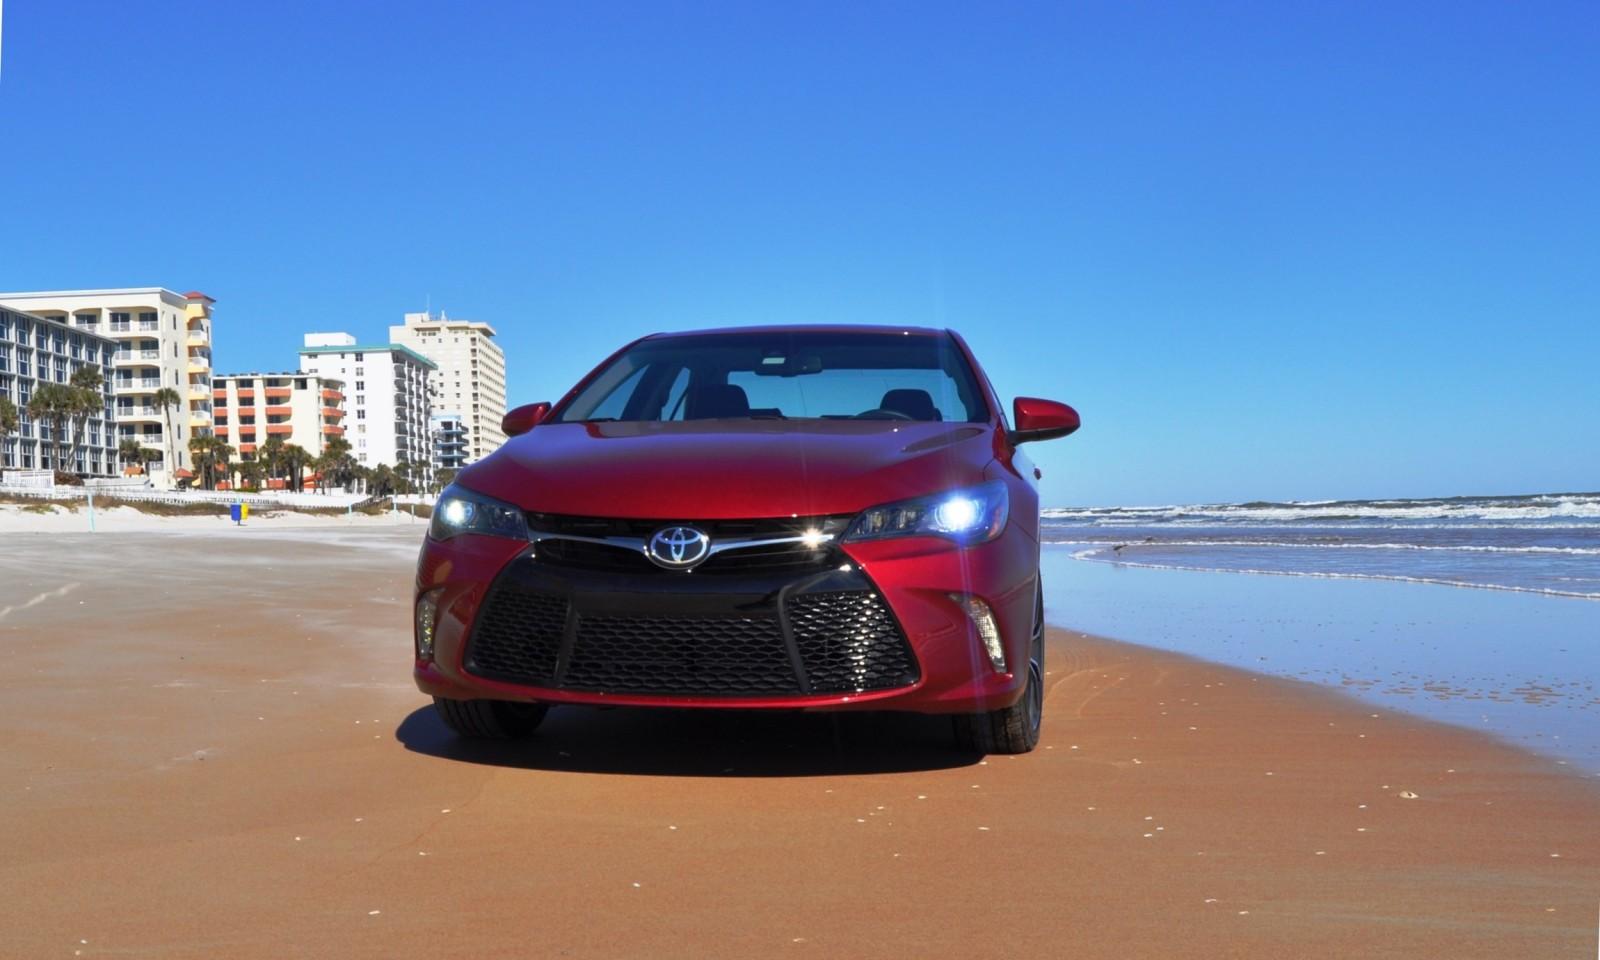 2015 Toyota Camry NASCAR Daytona Beach 48